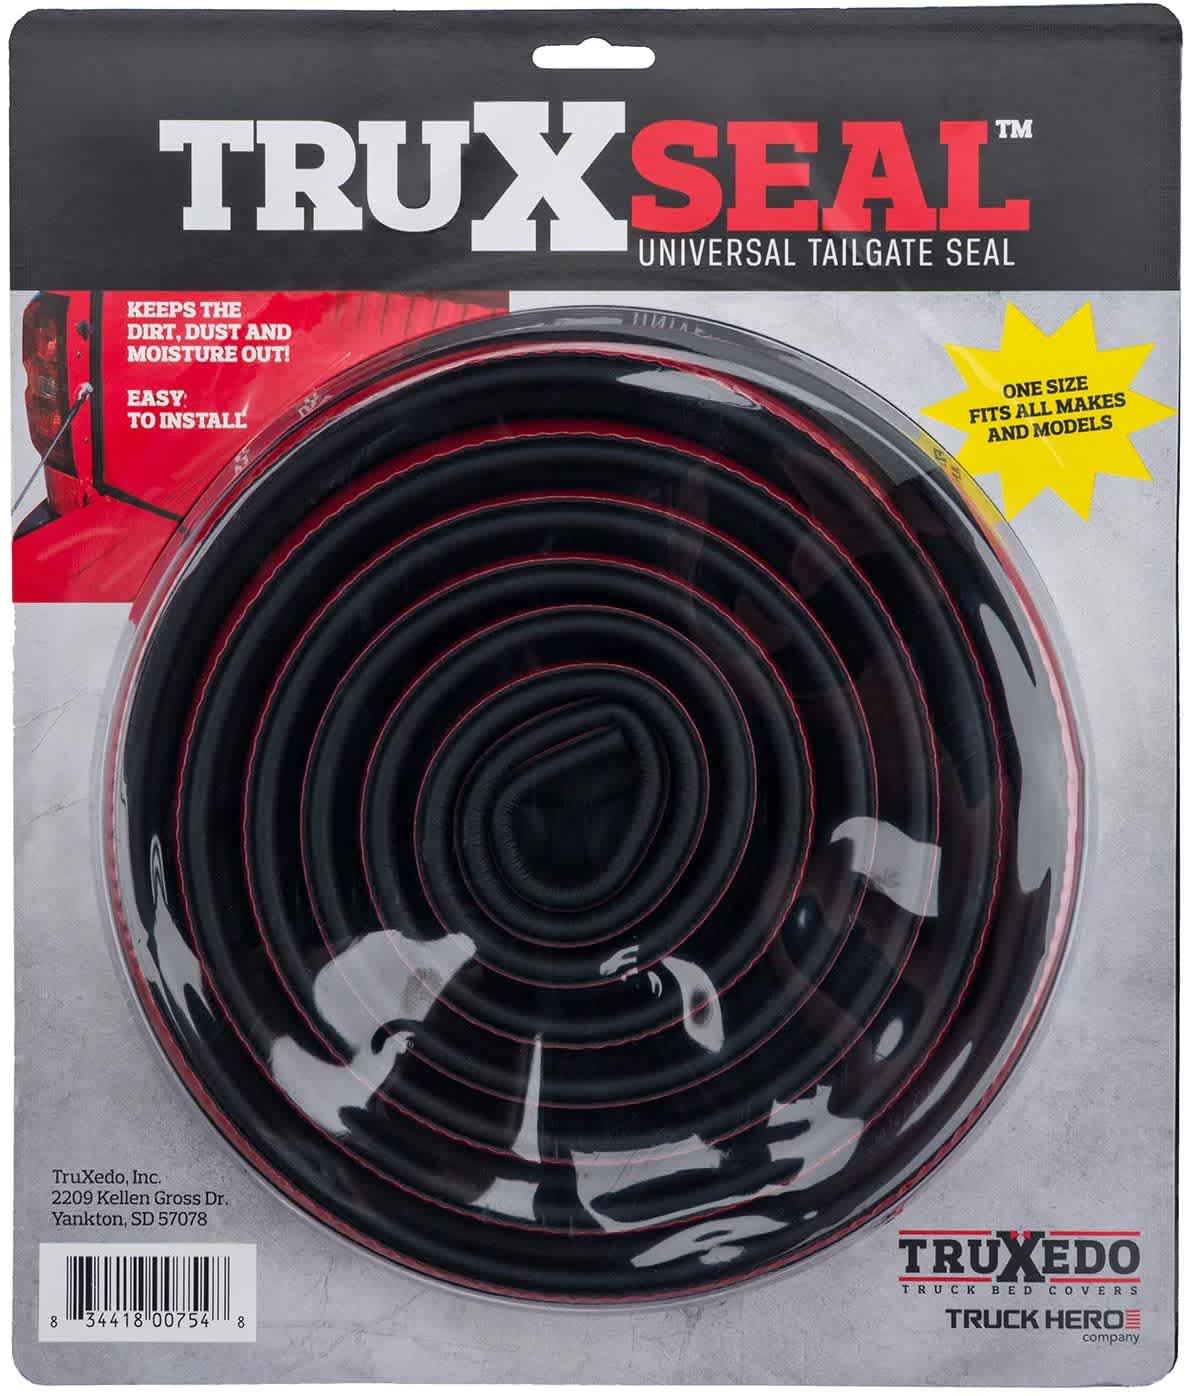 TruXseal Universal Tailgate Seal